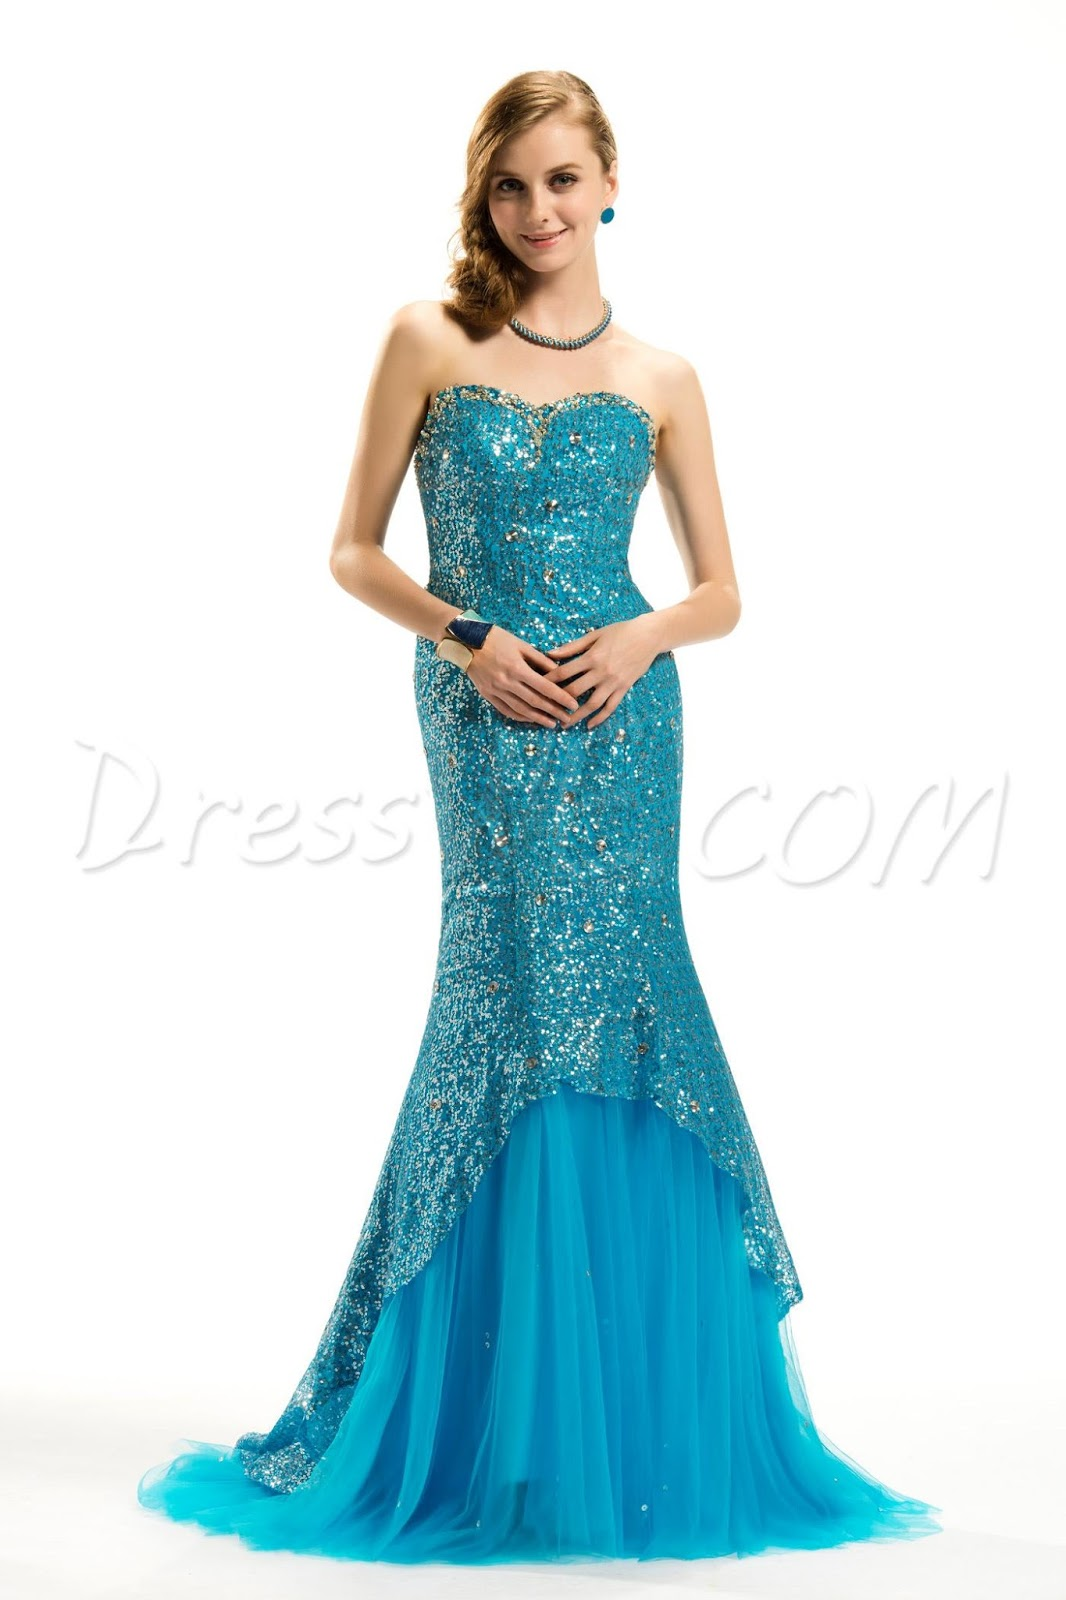 http://www.dresswe.com/item/10701885.html